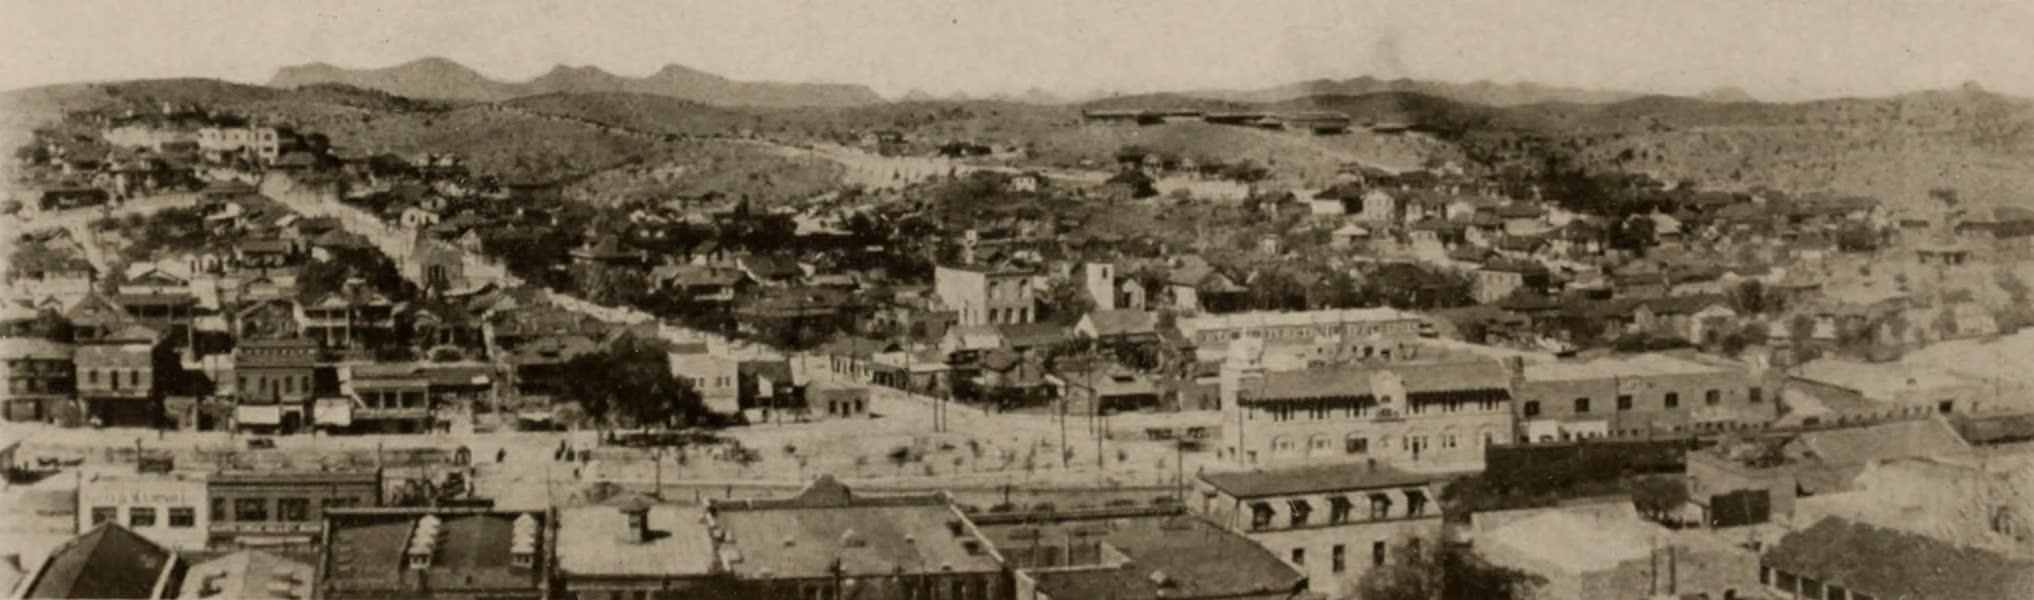 Arizona, The Wonderland - General View of Nogales, Arizona (1917)